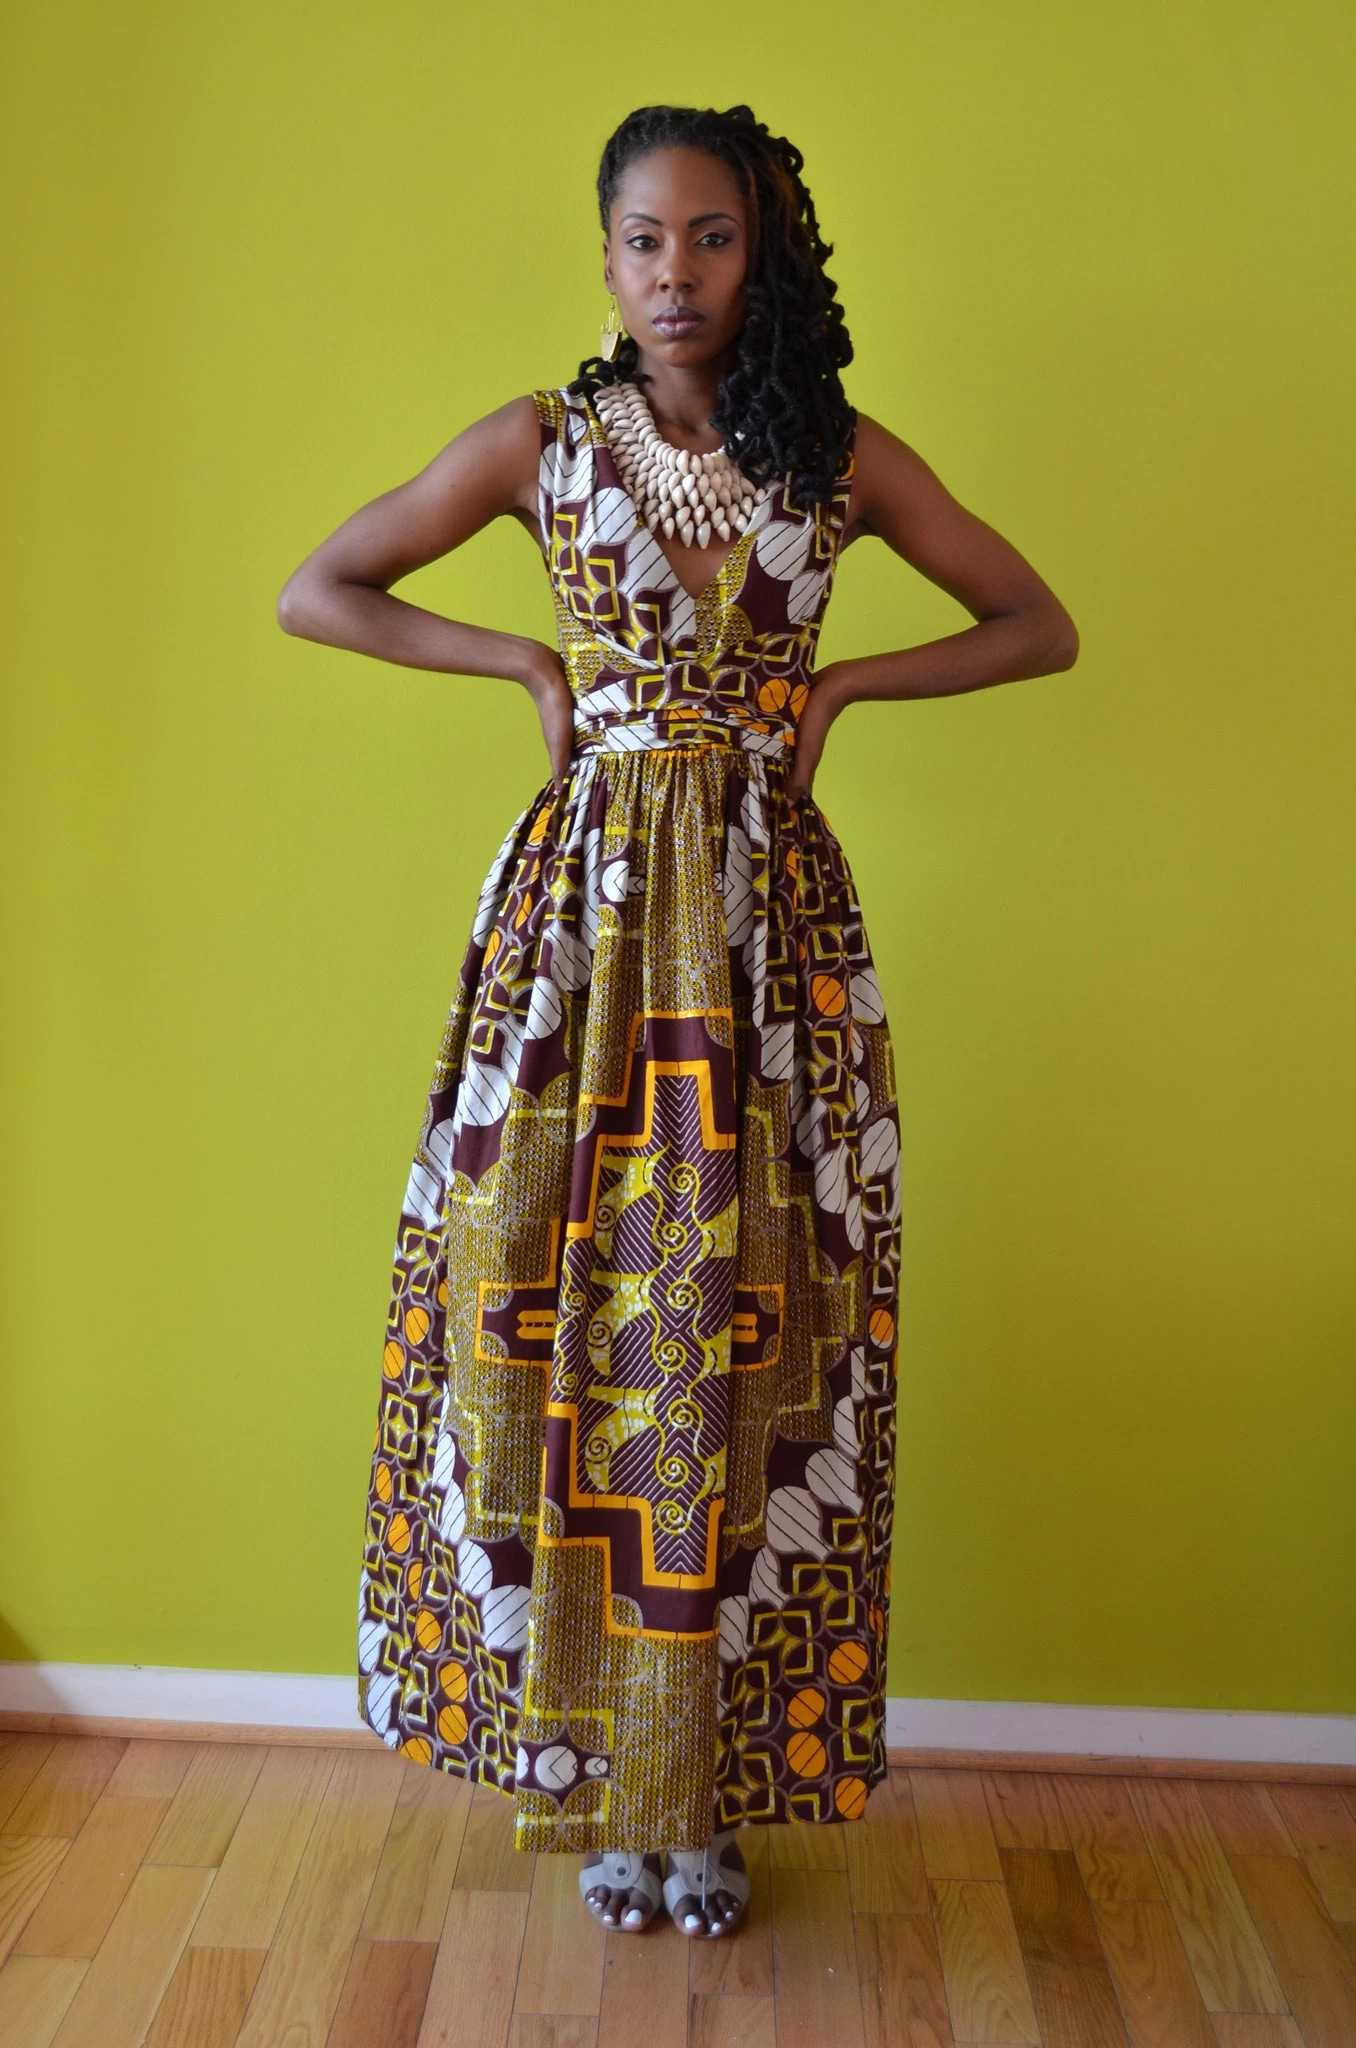 ce29426f3ea44 Scooper - Fashion News: Kitenge designs for breastfeeding mothers ...